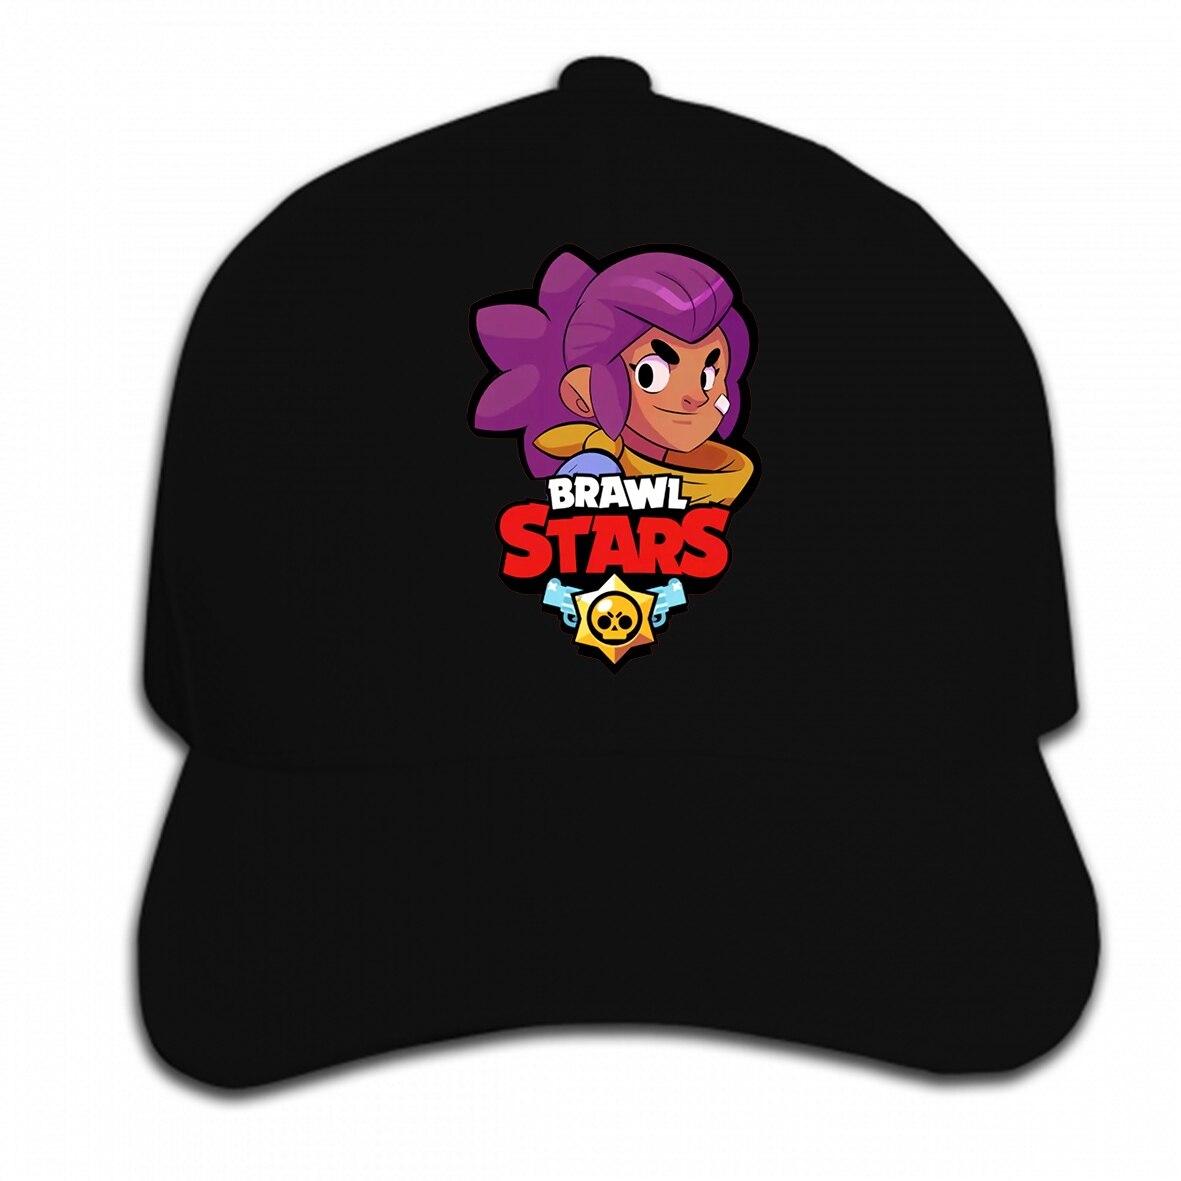 3f6025d8f61 best top 10 custom cap design brands and get free shipping - 7b3cmiae